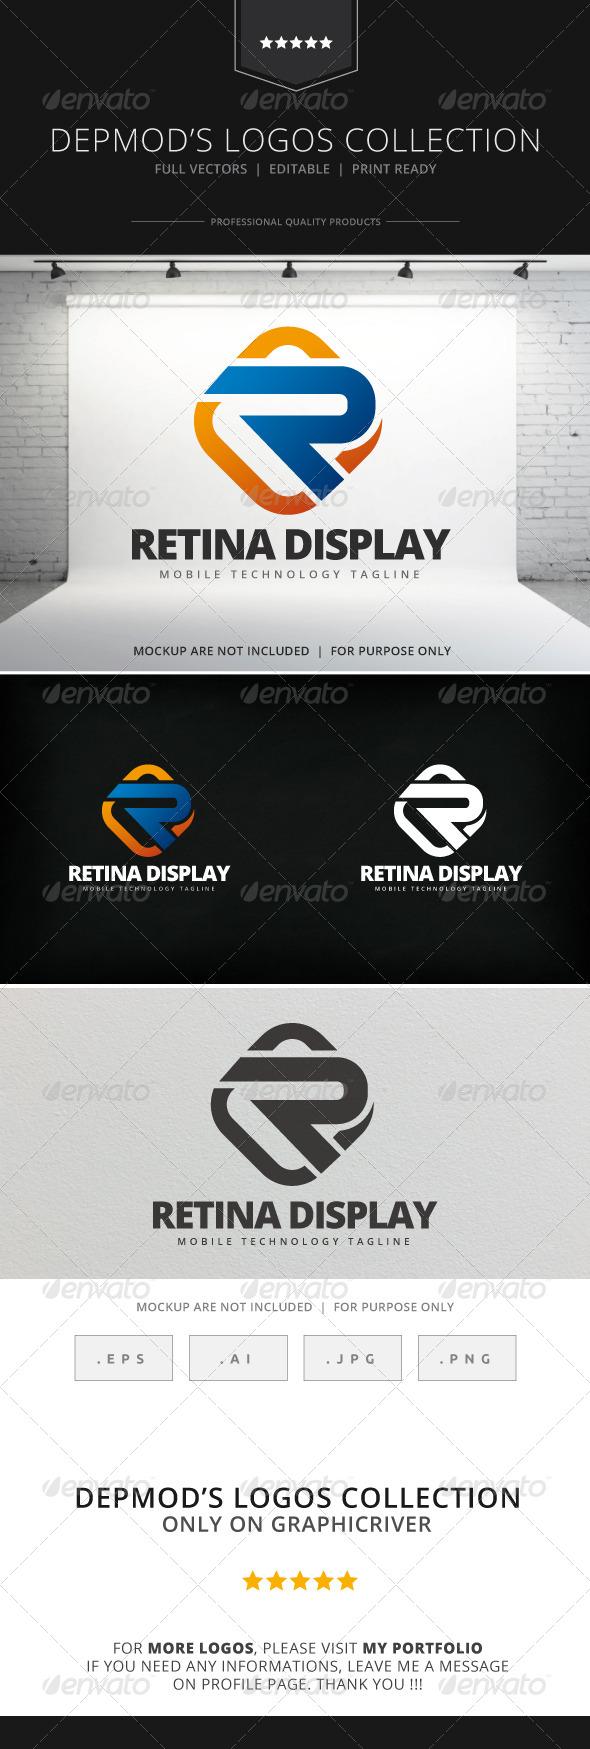 GraphicRiver Retina Display Logo 7972679